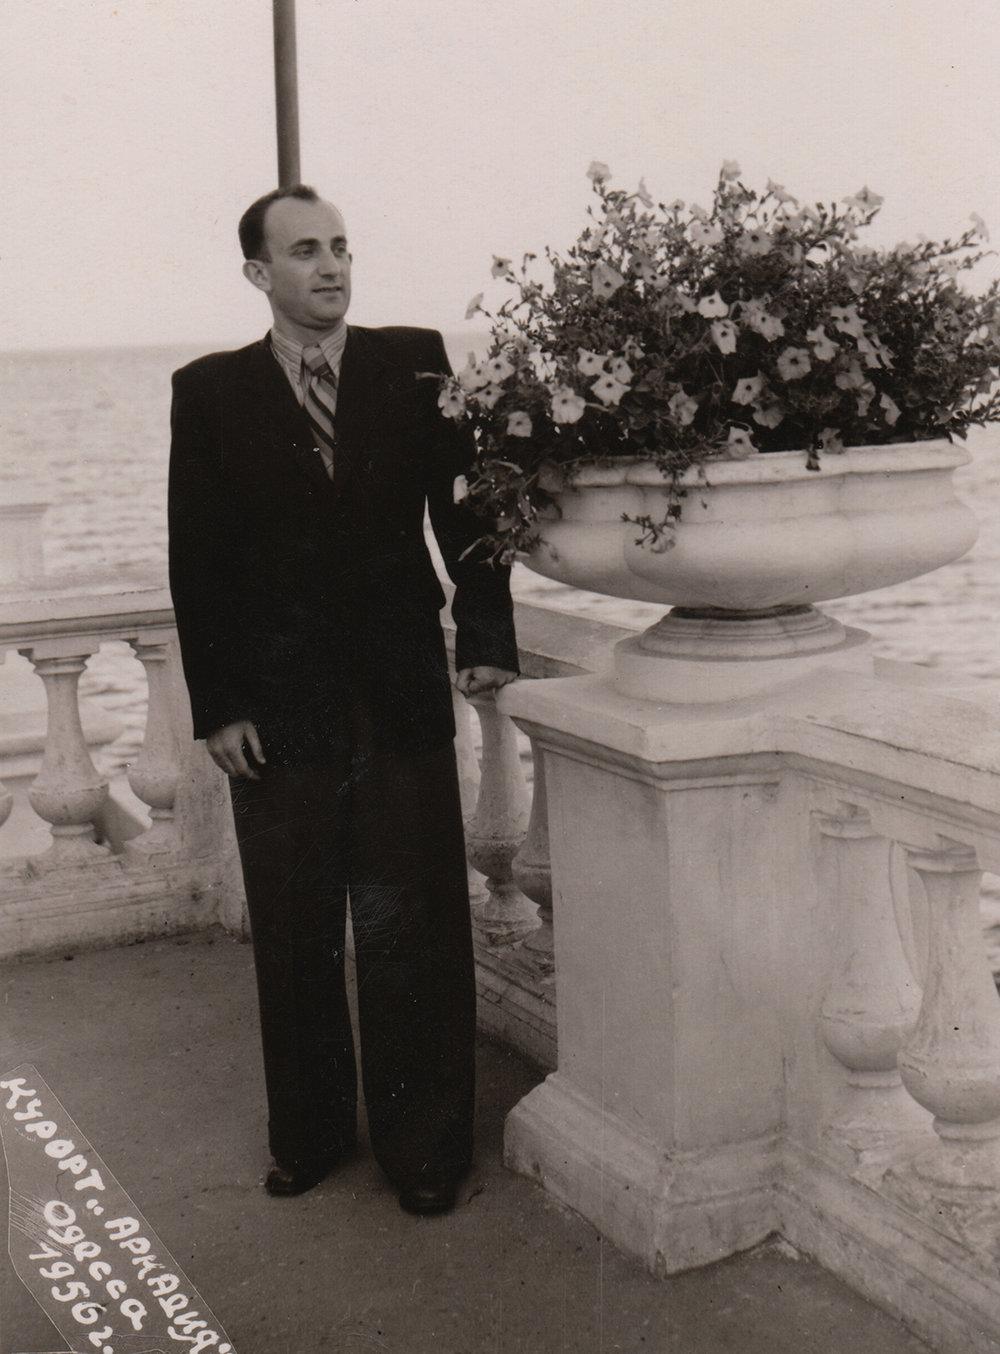 Abram Kipnis. Odesa, Ukraine, 1956